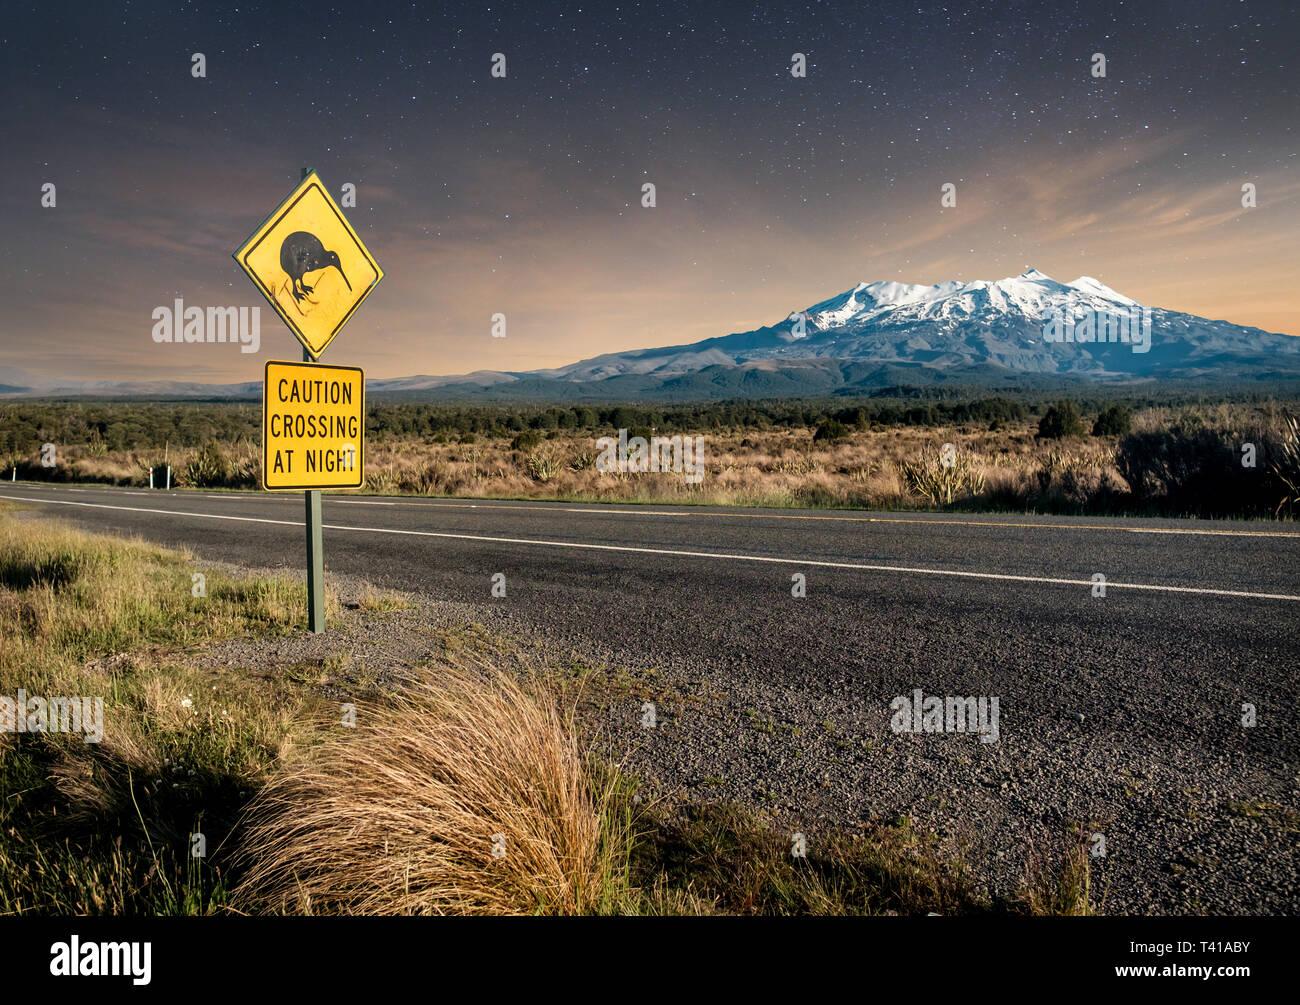 Kiwi crossing sign at night next to snowy Mount Ruapehu in New Zealand's Tongariro national park. - Stock Image